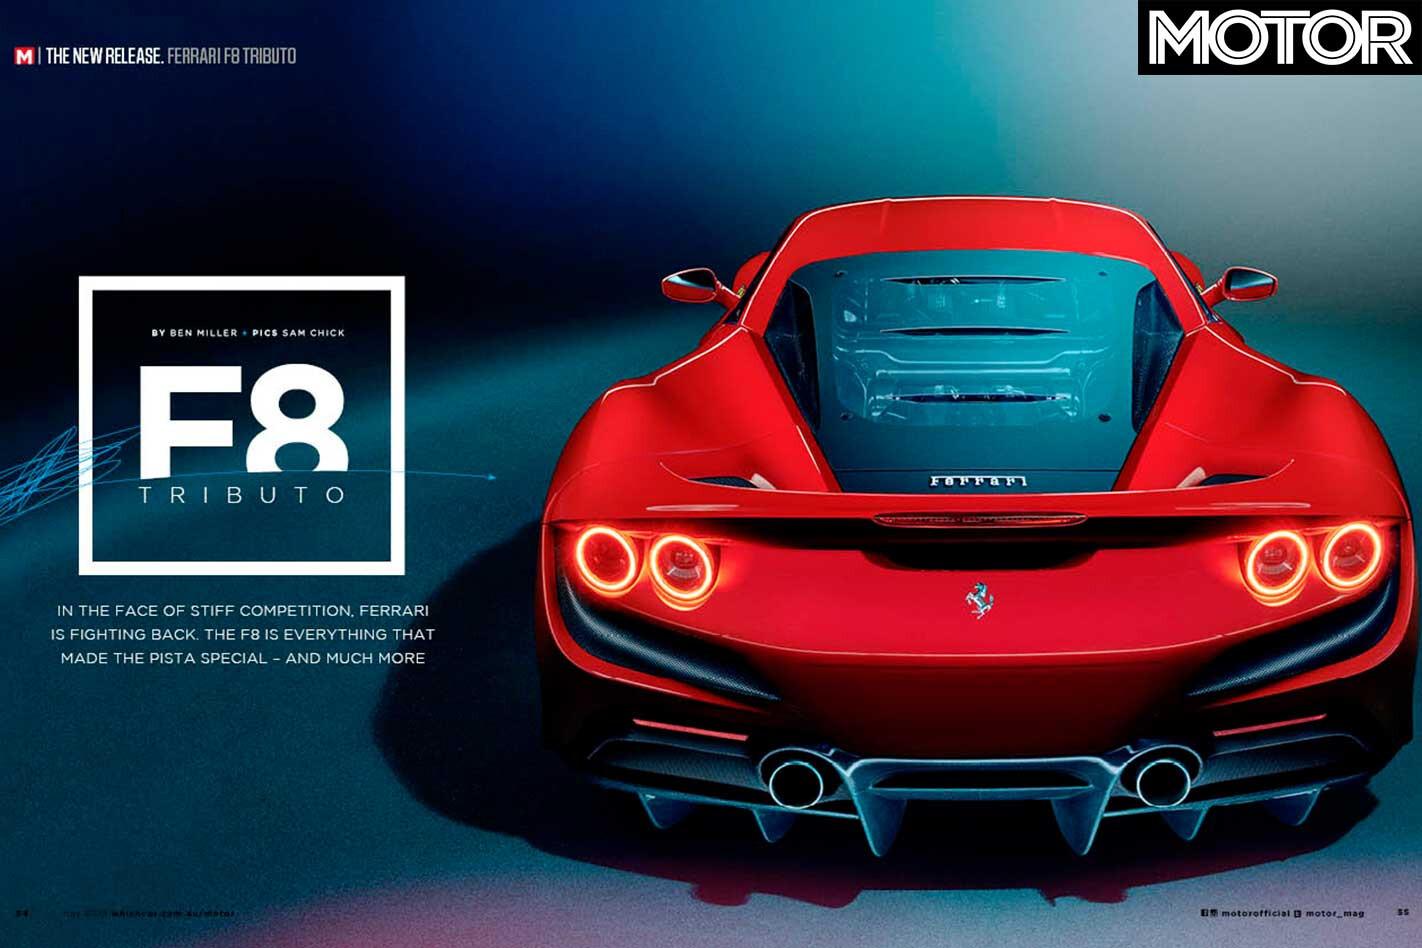 MOTOR Magazine May 2019 Issue Preview Ferrari F 8 Tributo Detailed Jpg